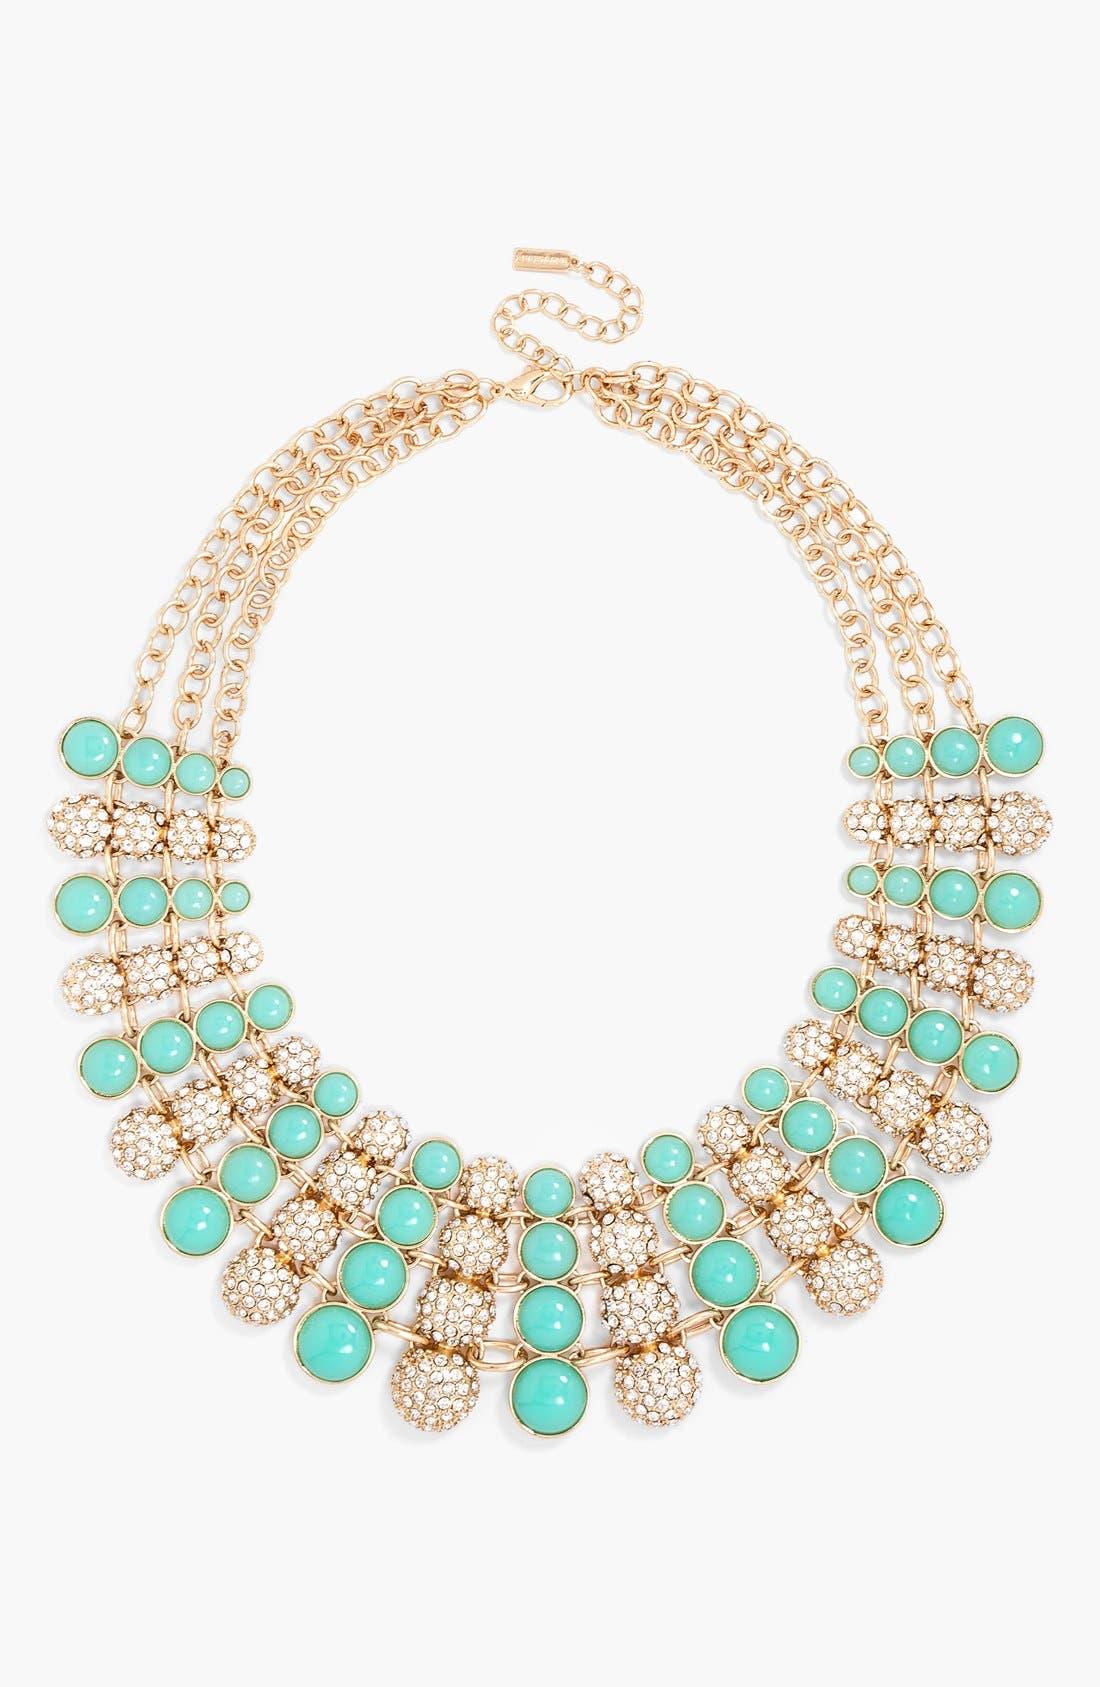 Main Image - BaubleBar 'Gold Nonpareil' Necklace